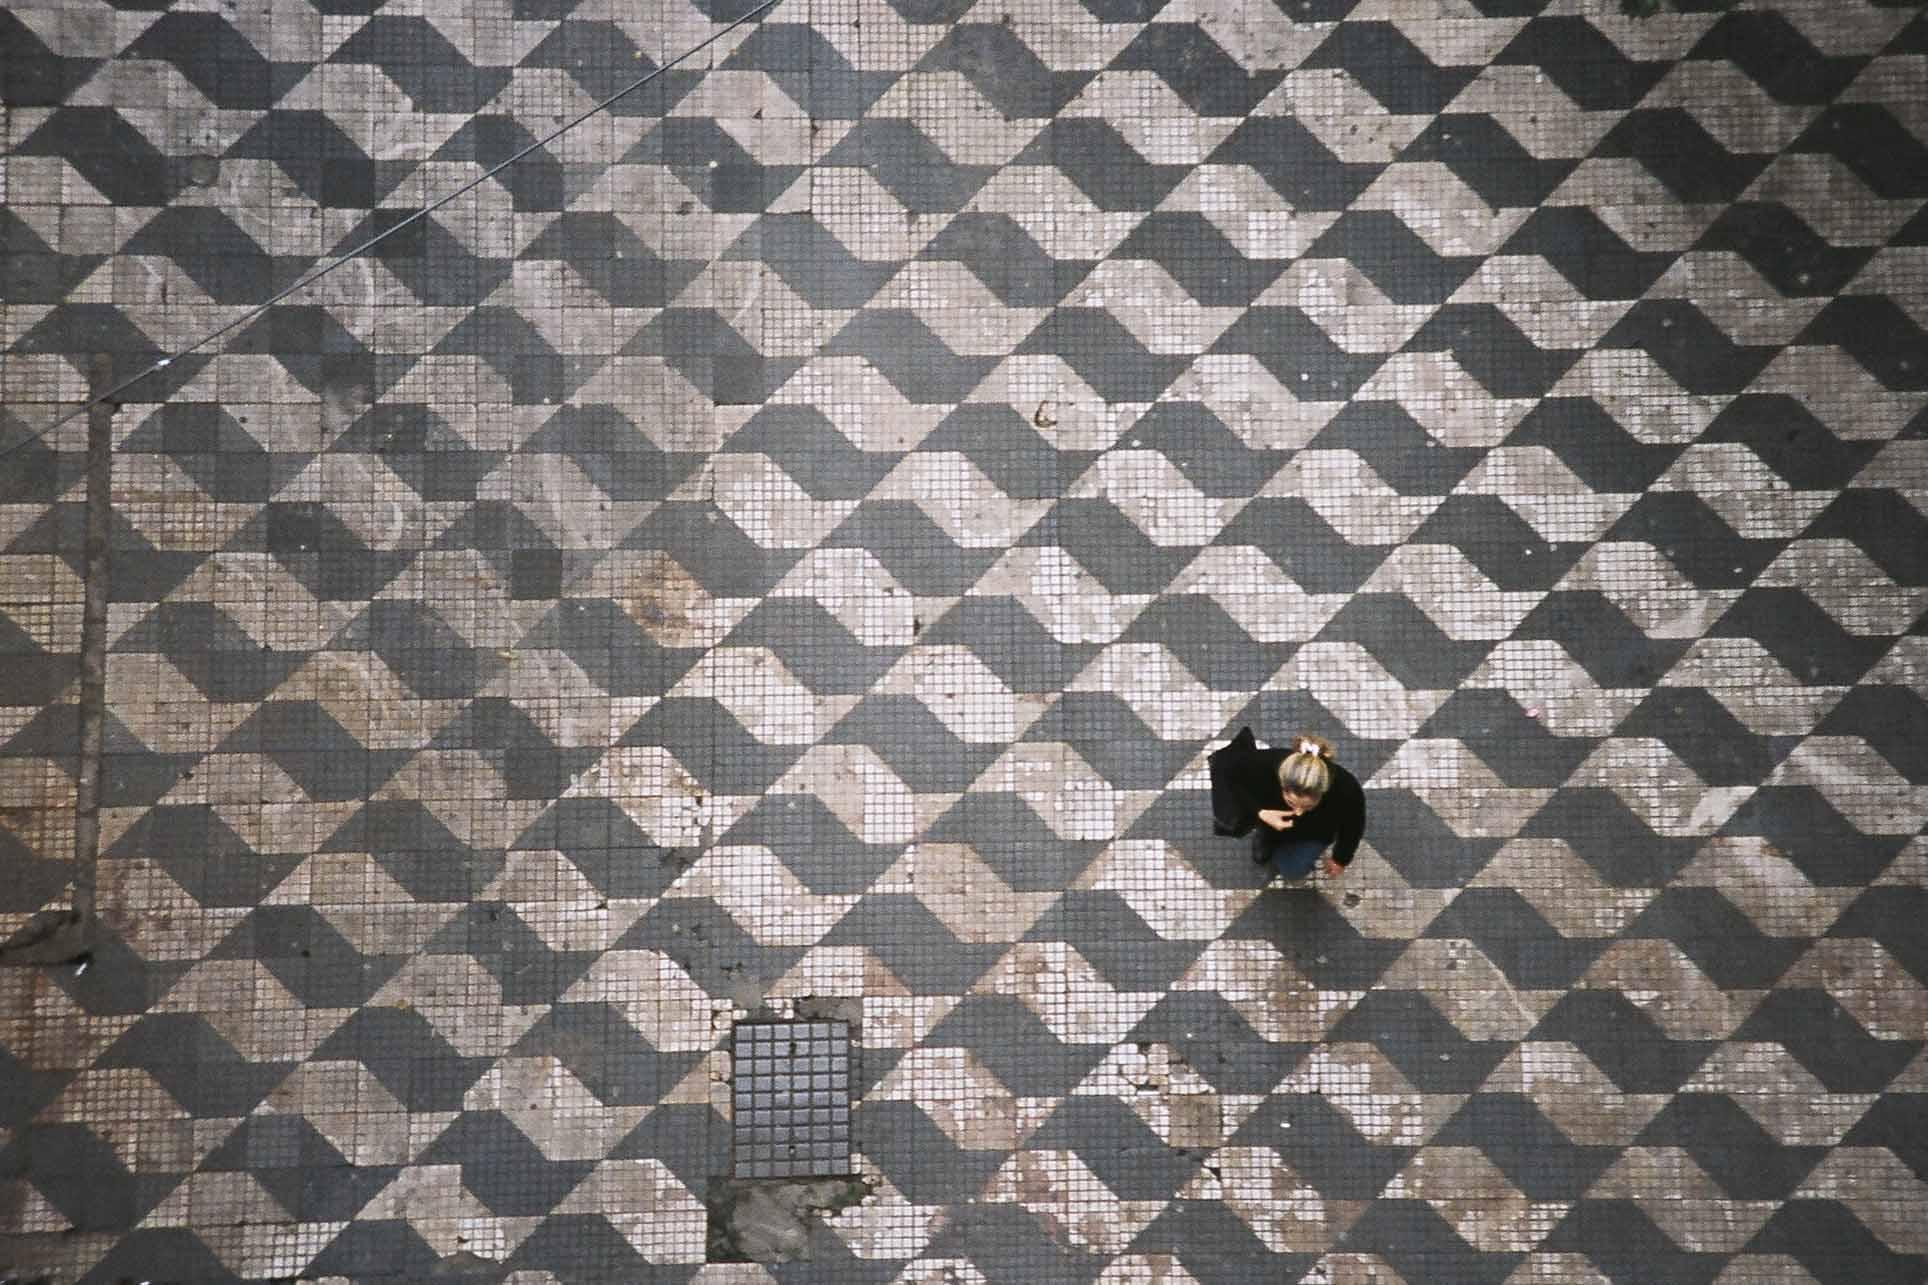 vanm-ecofriendly-made-in-belgium-sao-paulo-street-designer-mirthes-bernardes-credit-sao-paulo-blog-da-arquitetura